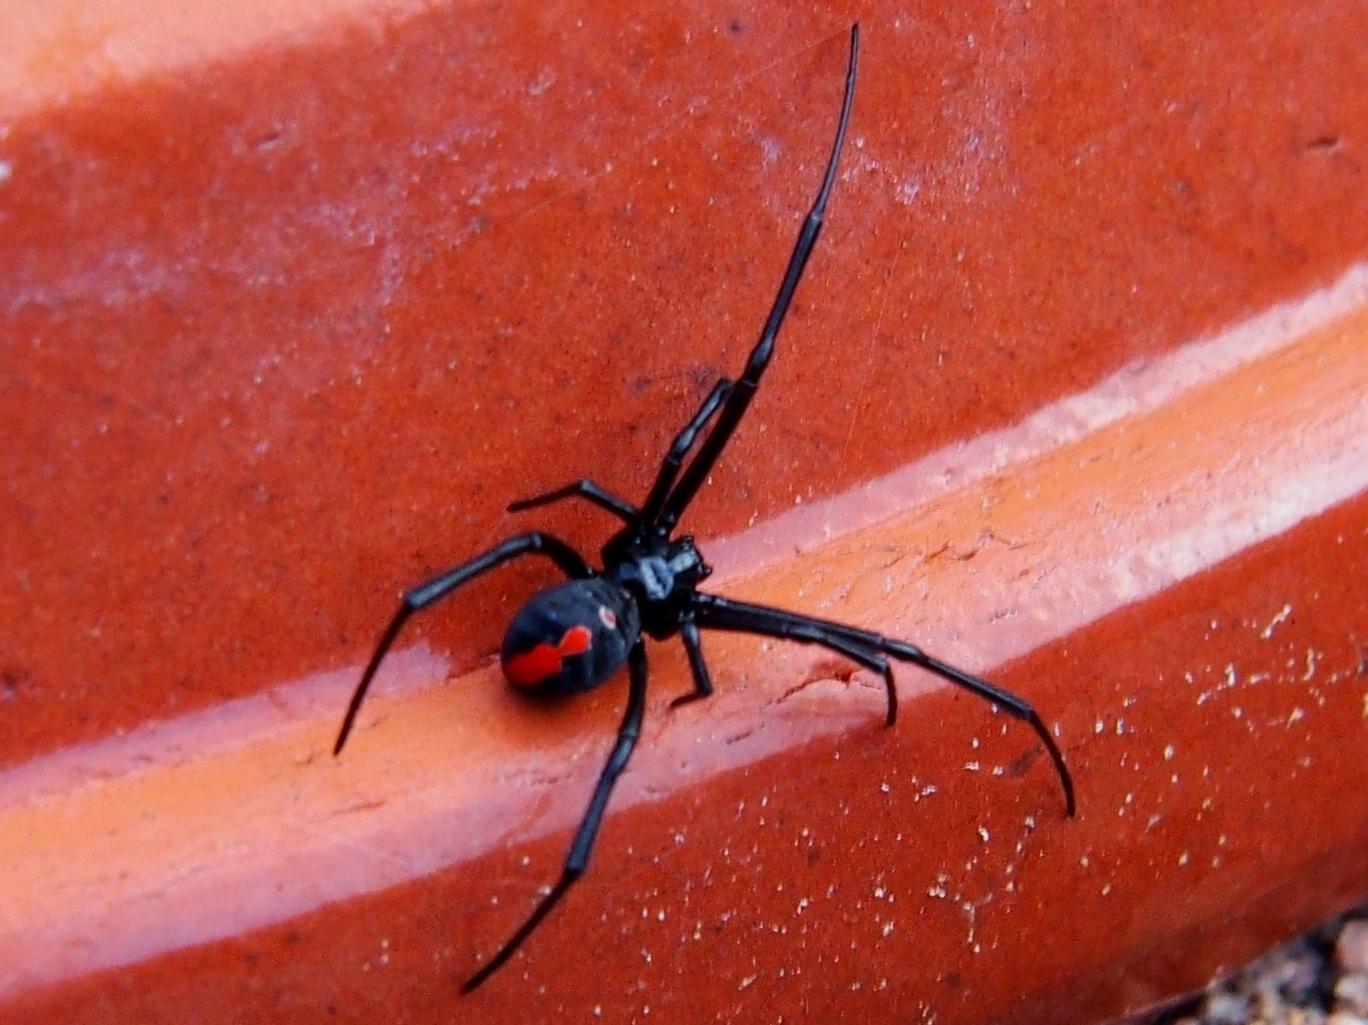 pest control image 57